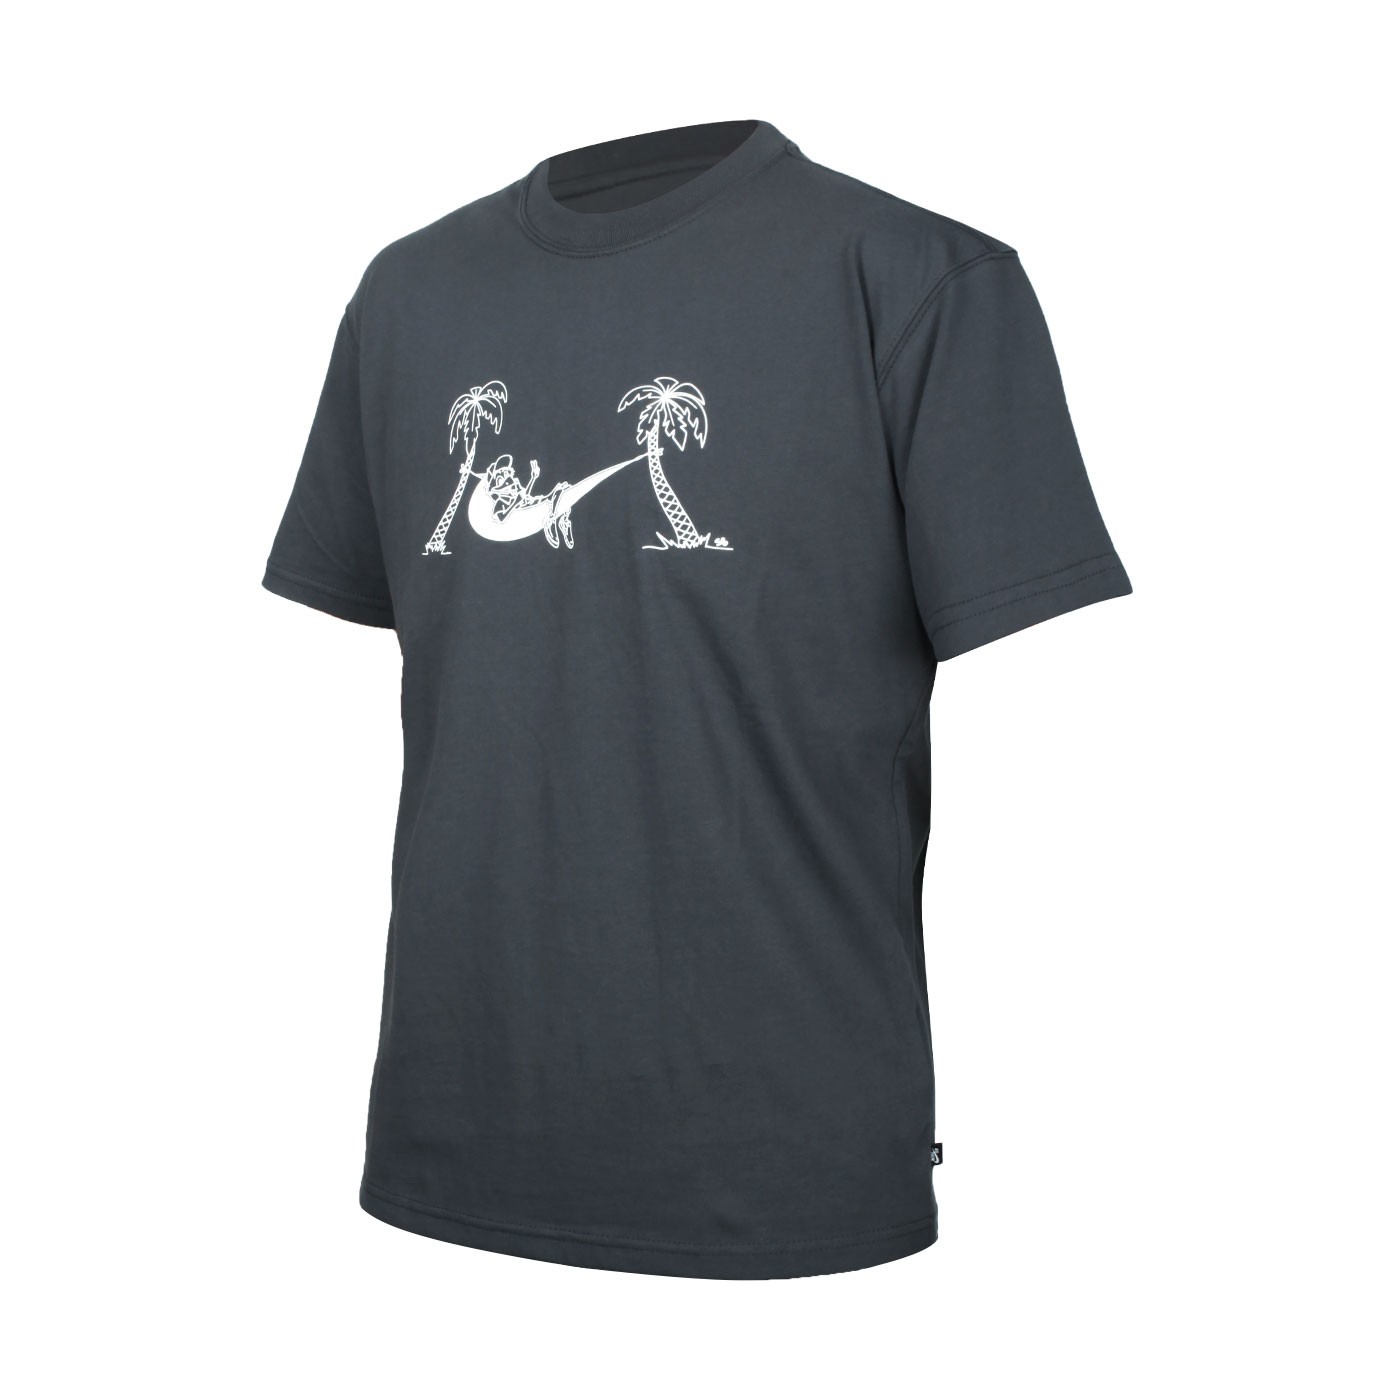 NIKE 男款短袖T恤 CZ6174-060